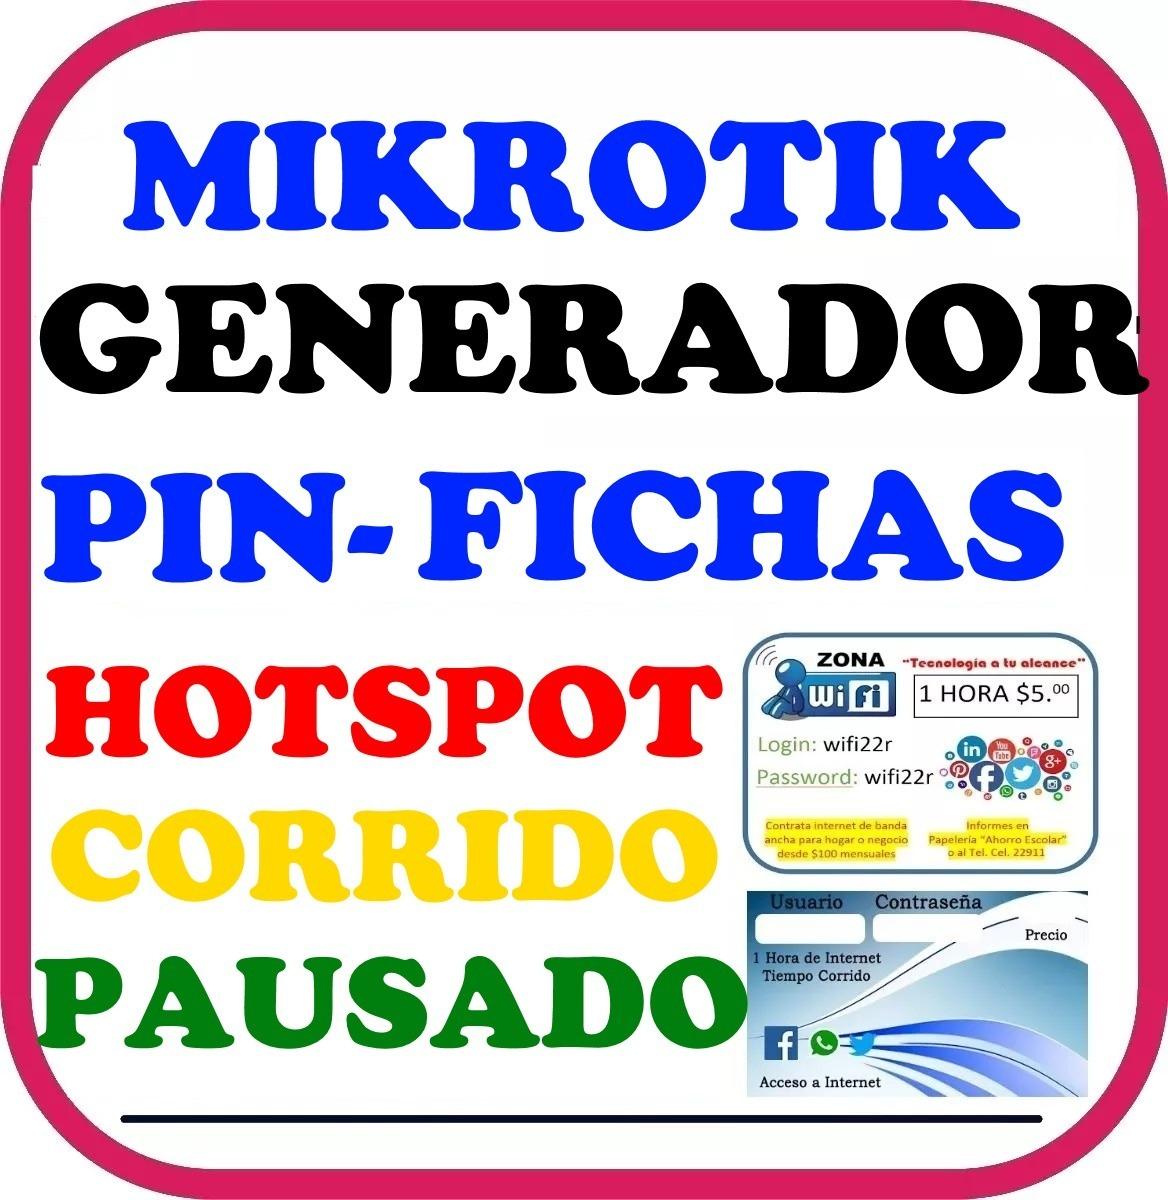 Mikrotik Hotspot+internet Por Pin Horas Dias O Megas Voucher